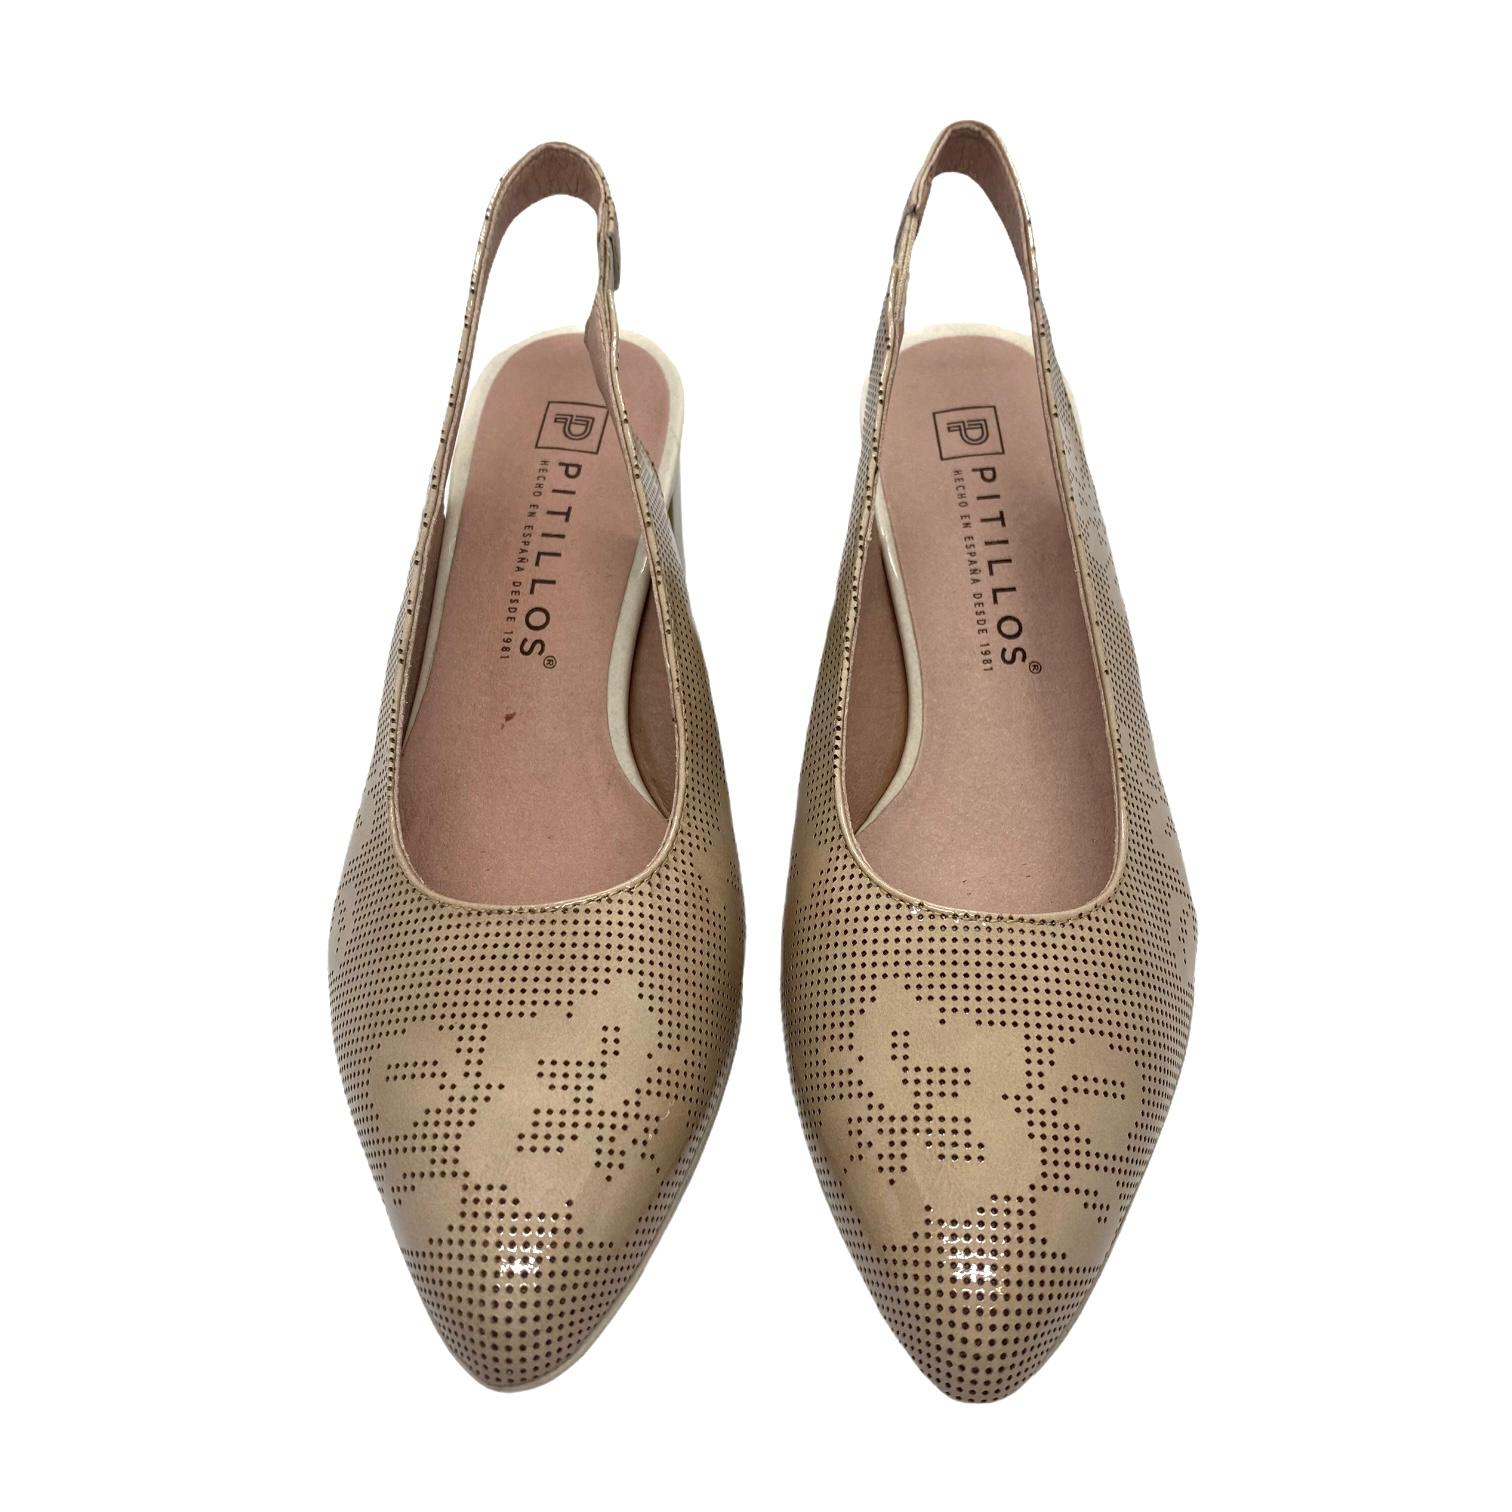 Pantofi decupati Pitillos bej cu perforatii si model